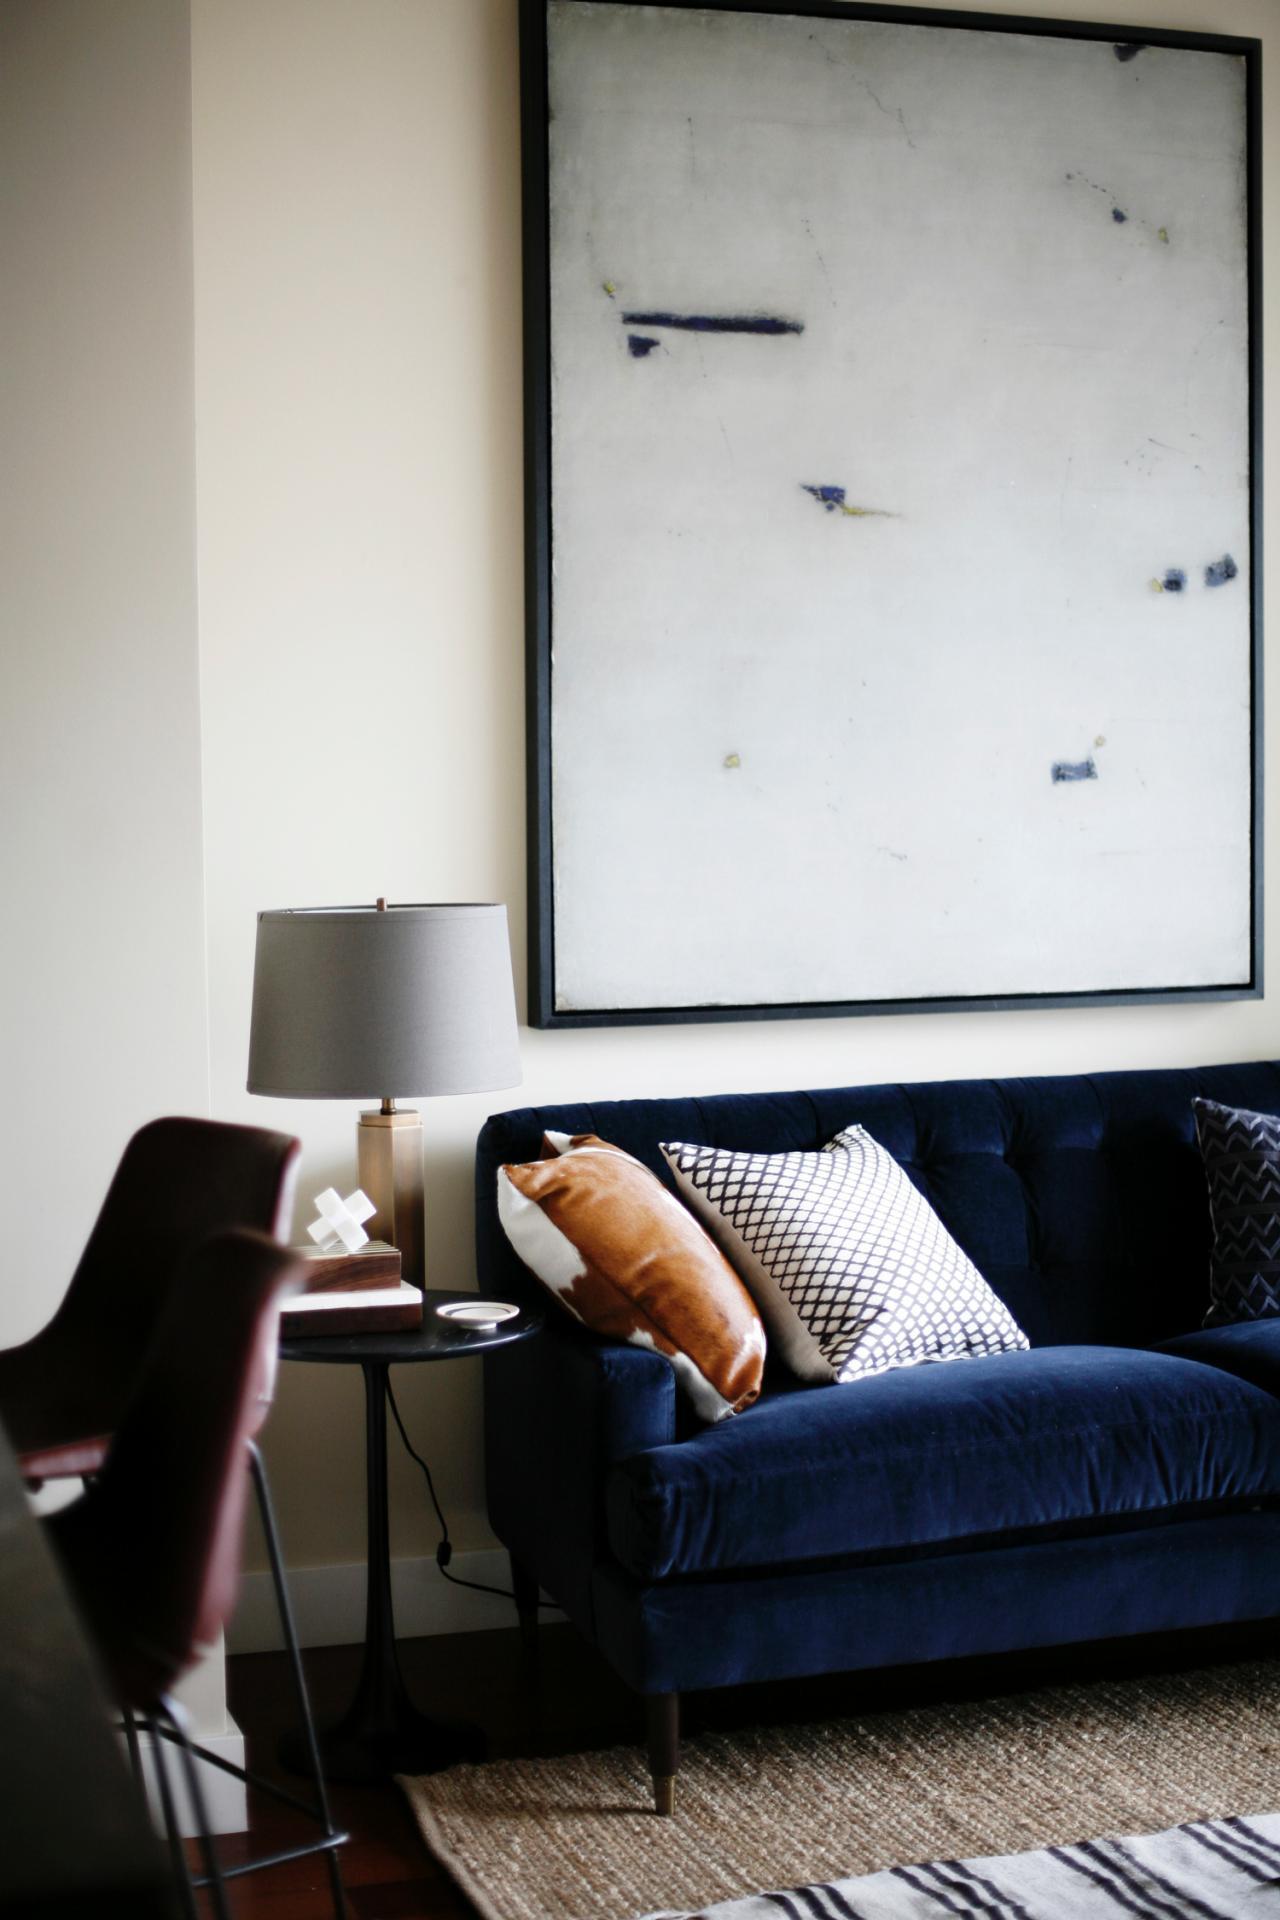 Cool Down Your Design With Blue Velvet Furniture HGTVs - Blue sofa living room design